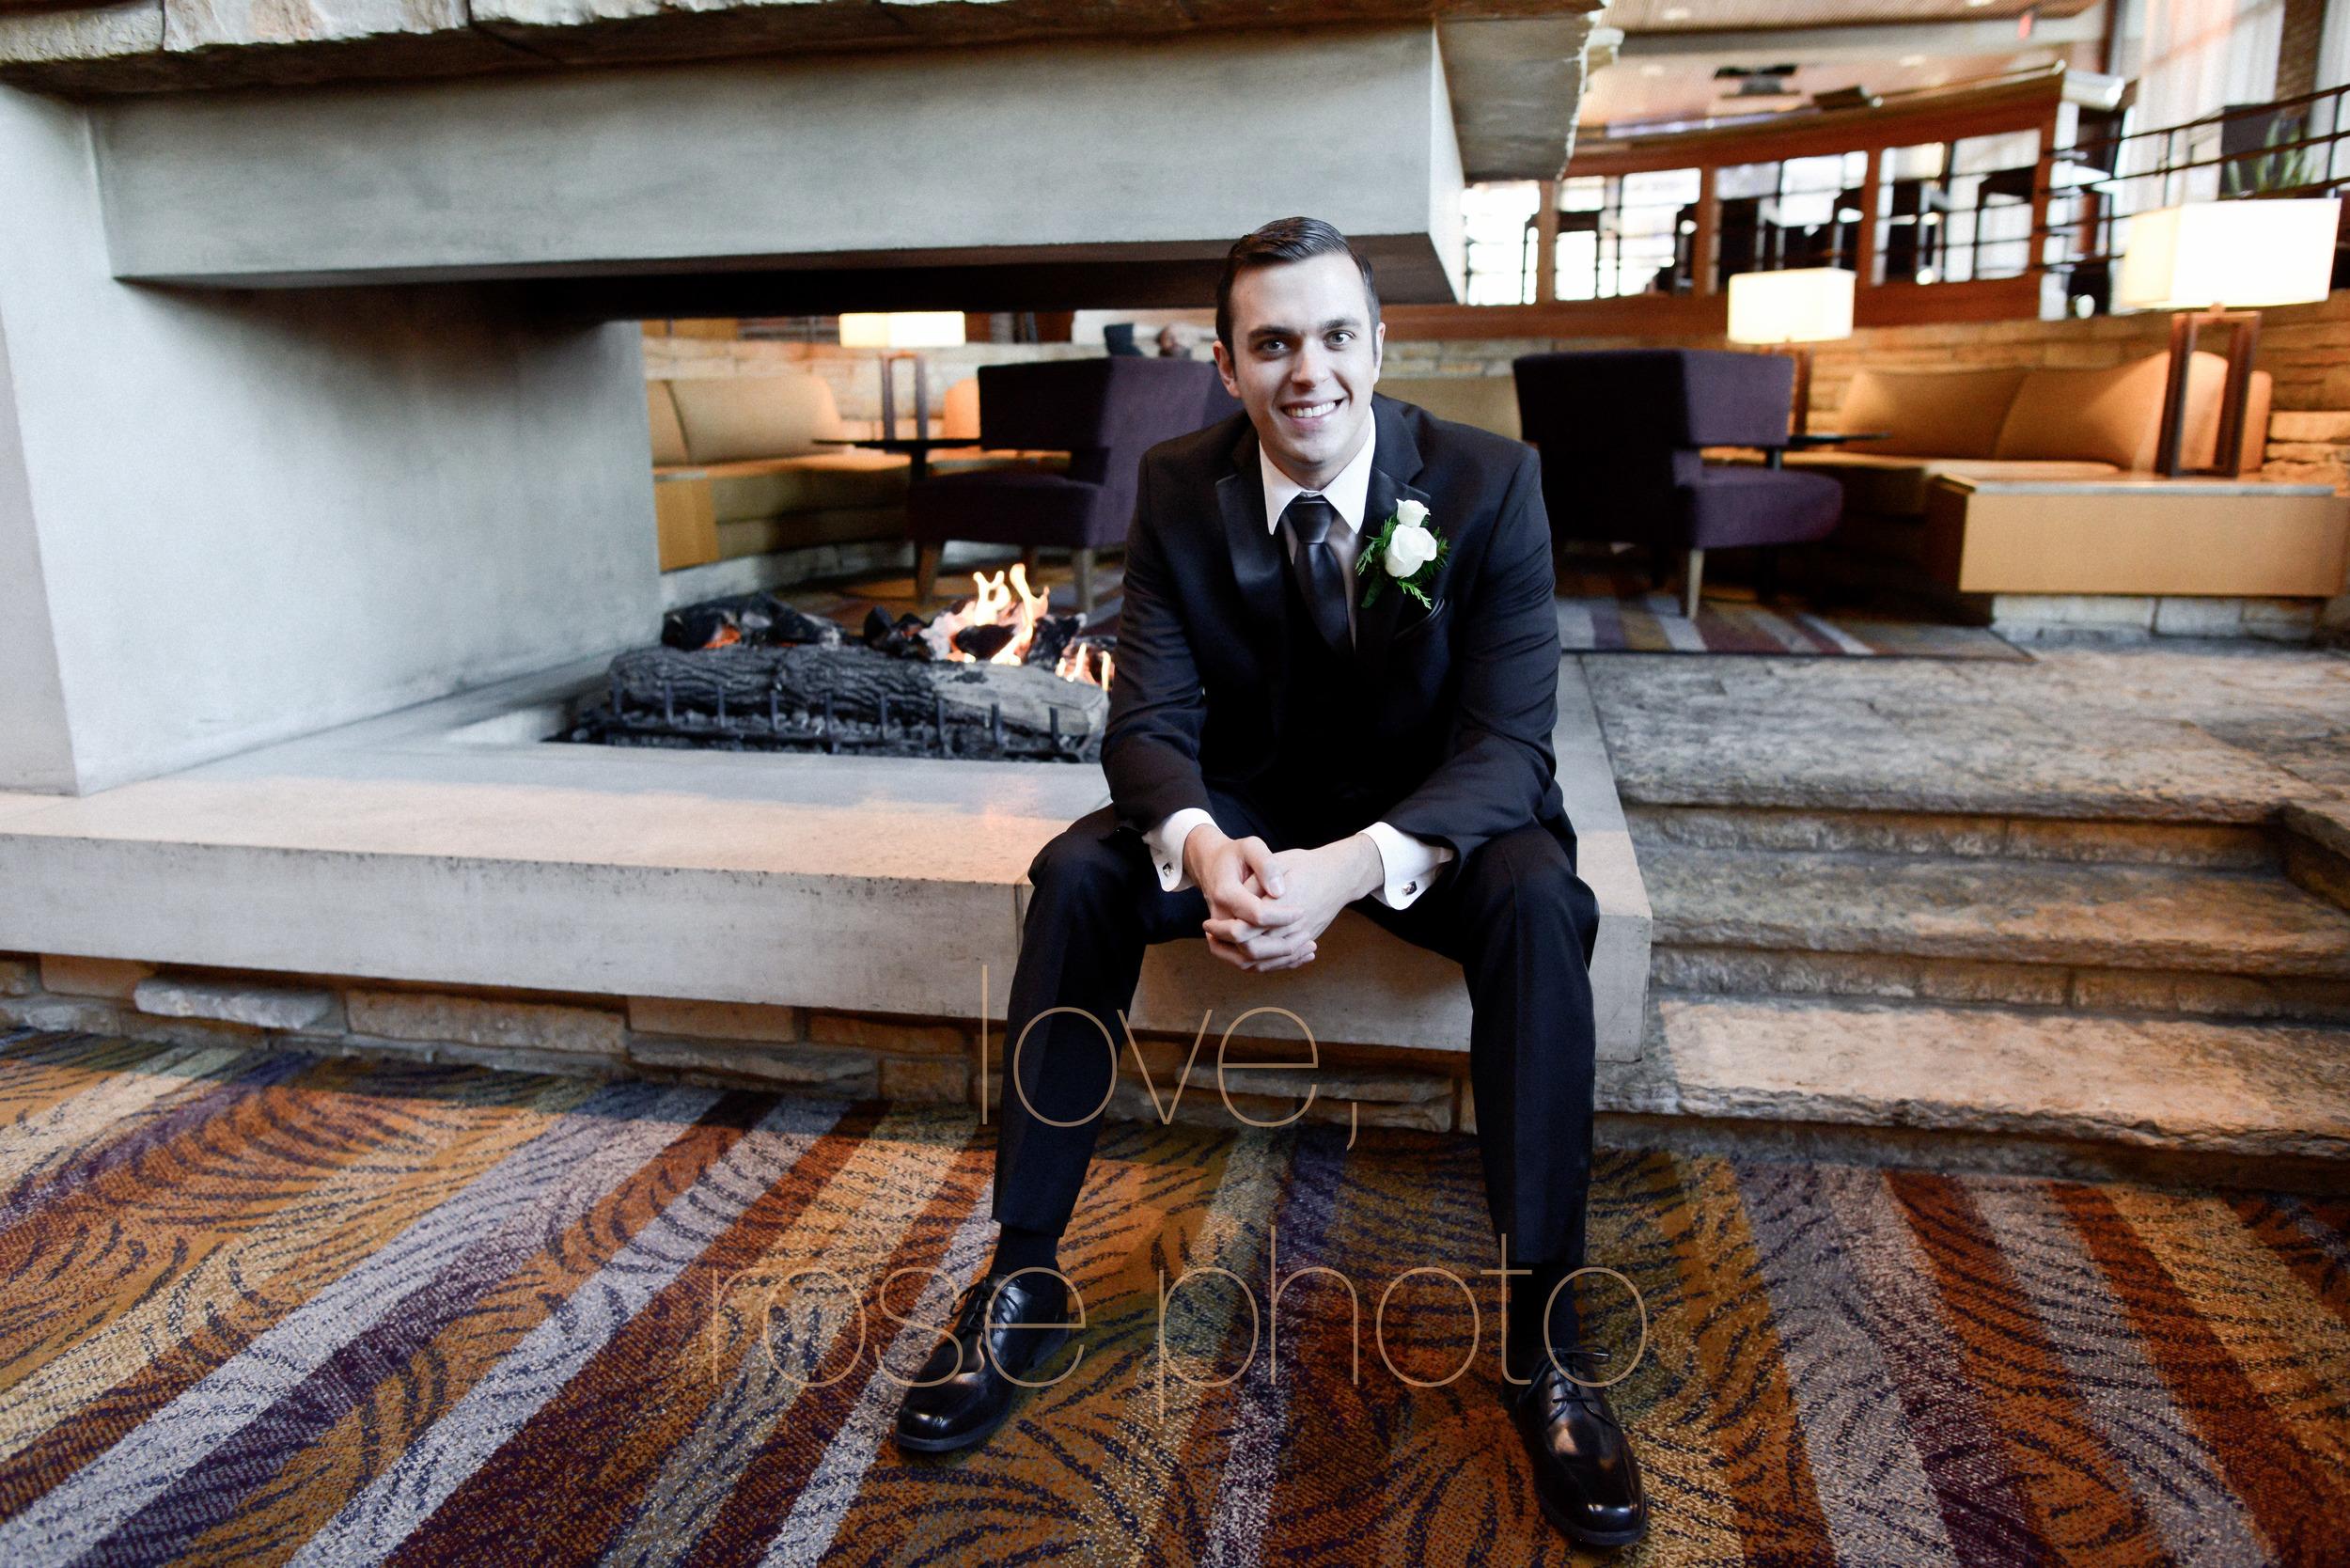 katie + even new years eve chicago oak brook mcdonalds lodge 2014 polish wedding balloon drop champagne-004-2.jpg